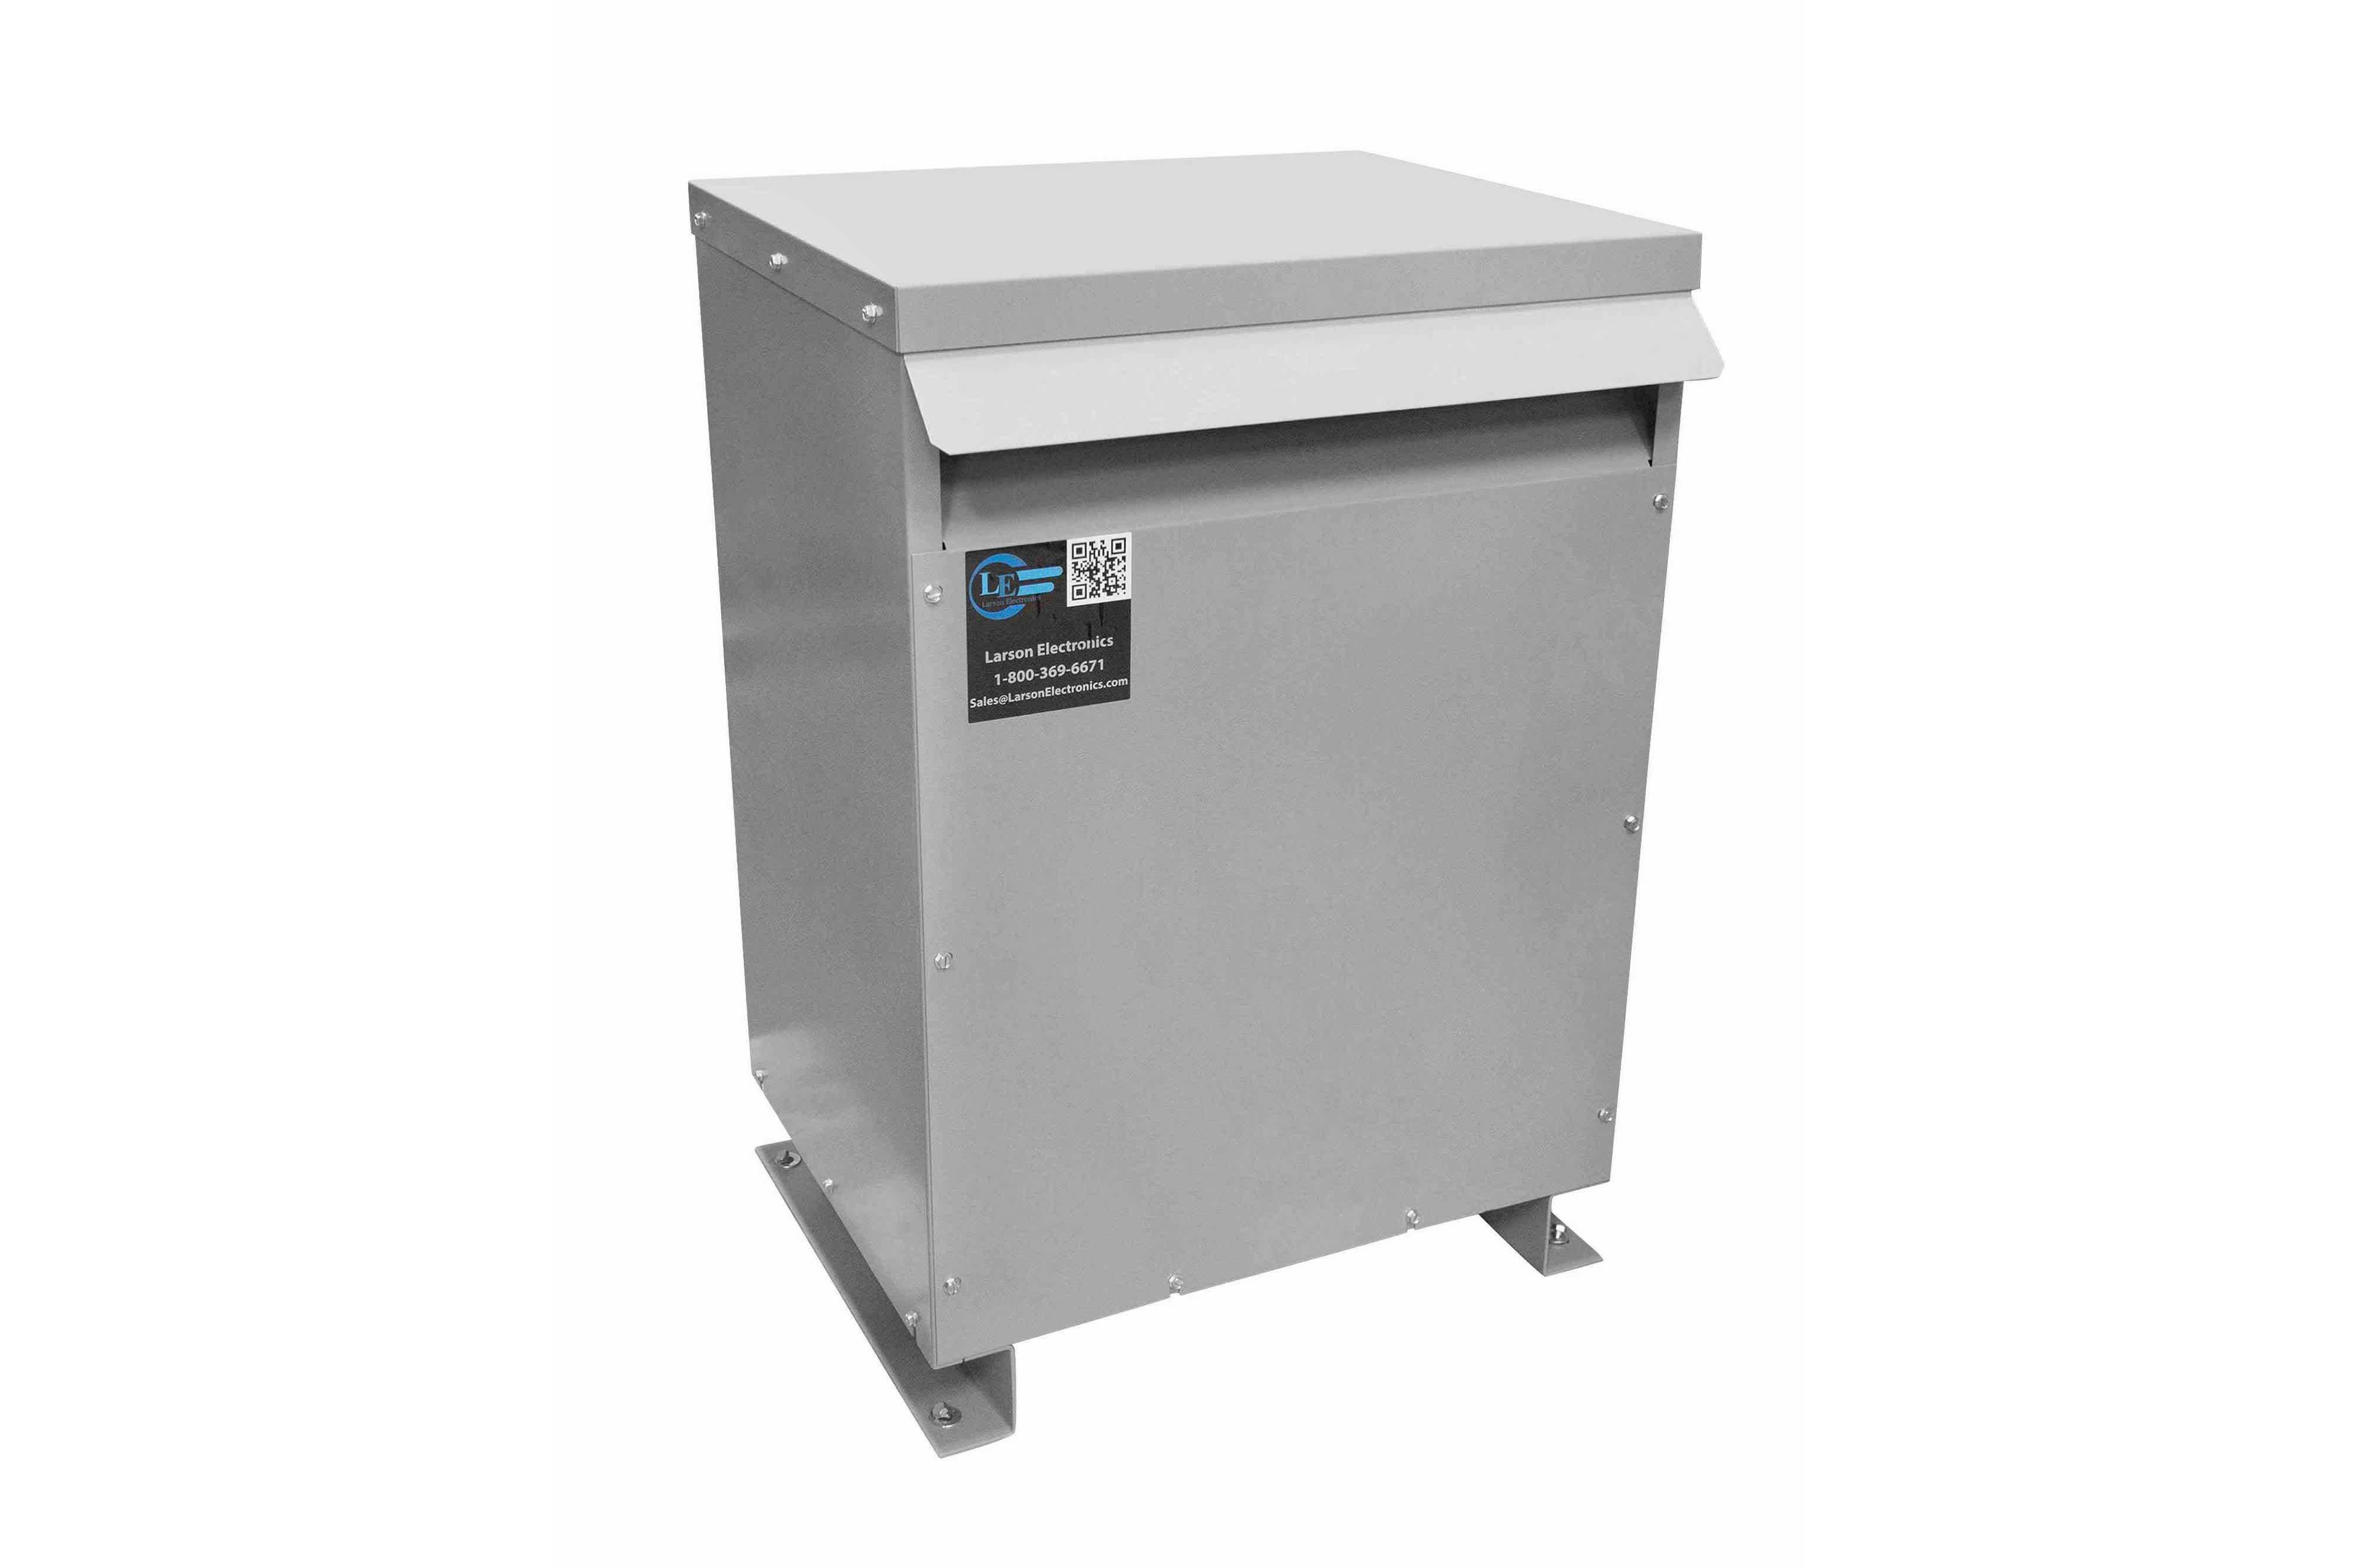 14 kVA 3PH Isolation Transformer, 220V Wye Primary, 480Y/277 Wye-N Secondary, N3R, Ventilated, 60 Hz